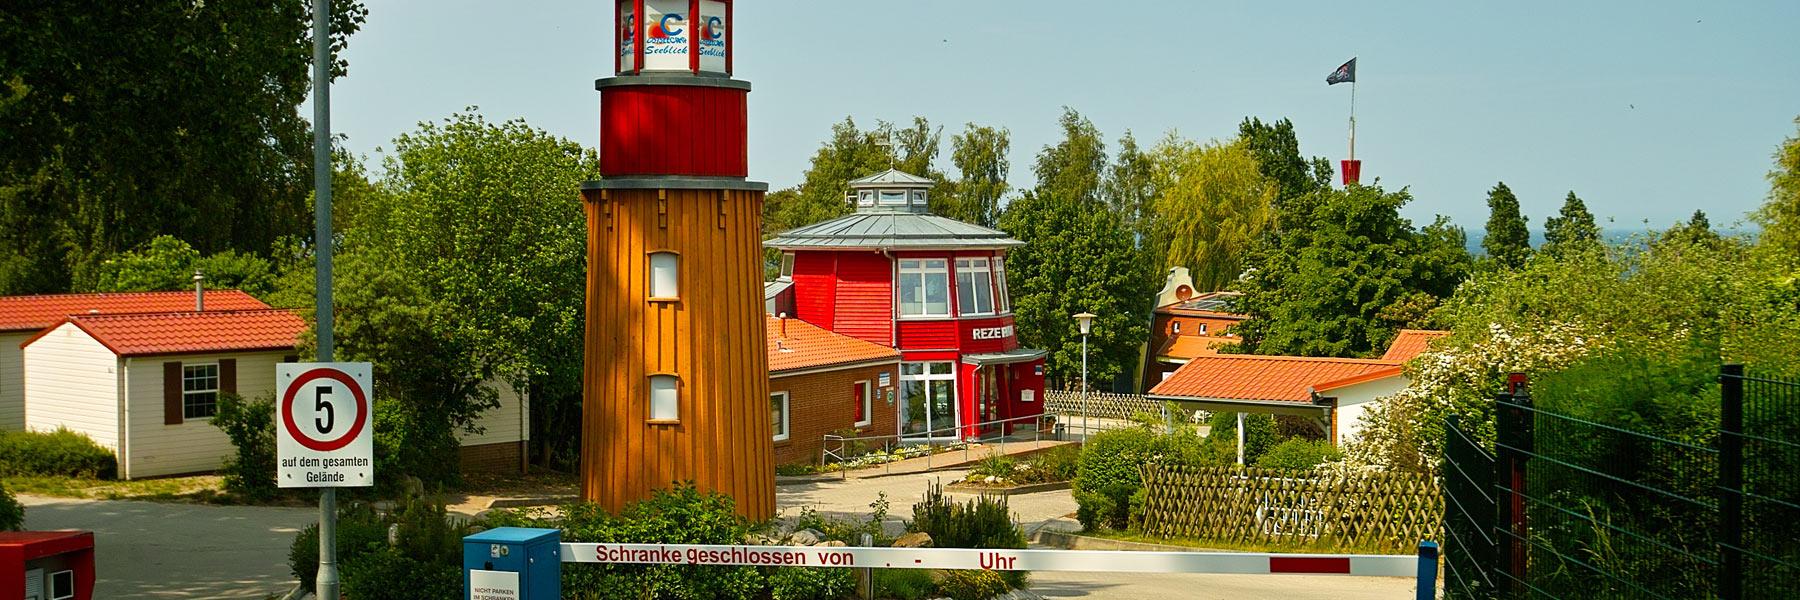 Einfahrt - Ostseecamp Seeblick